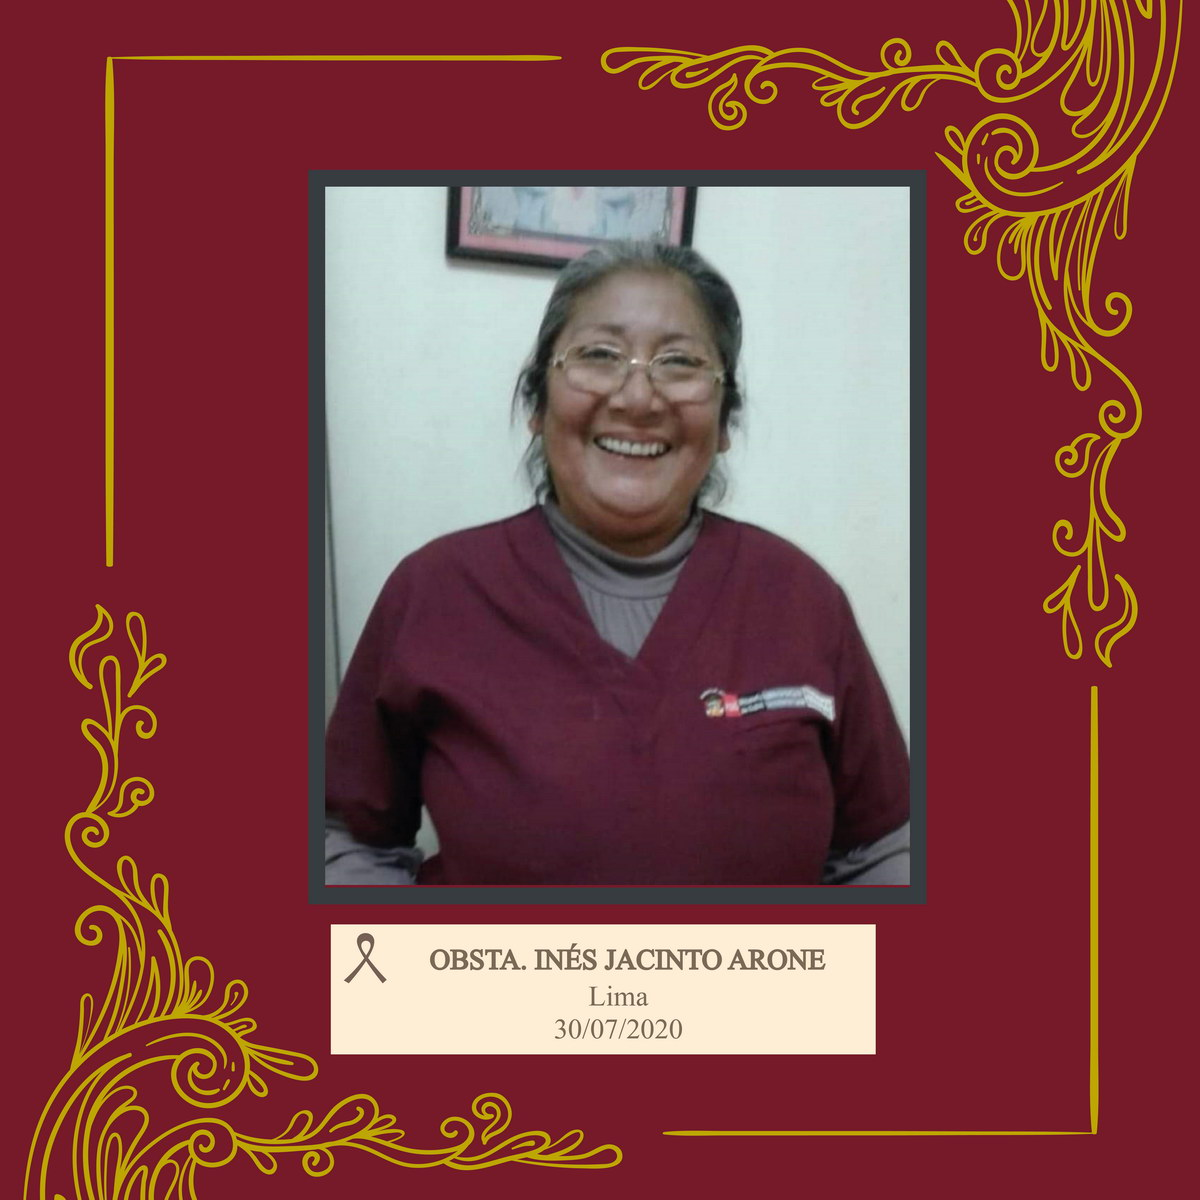 Inés Jacinto Arone